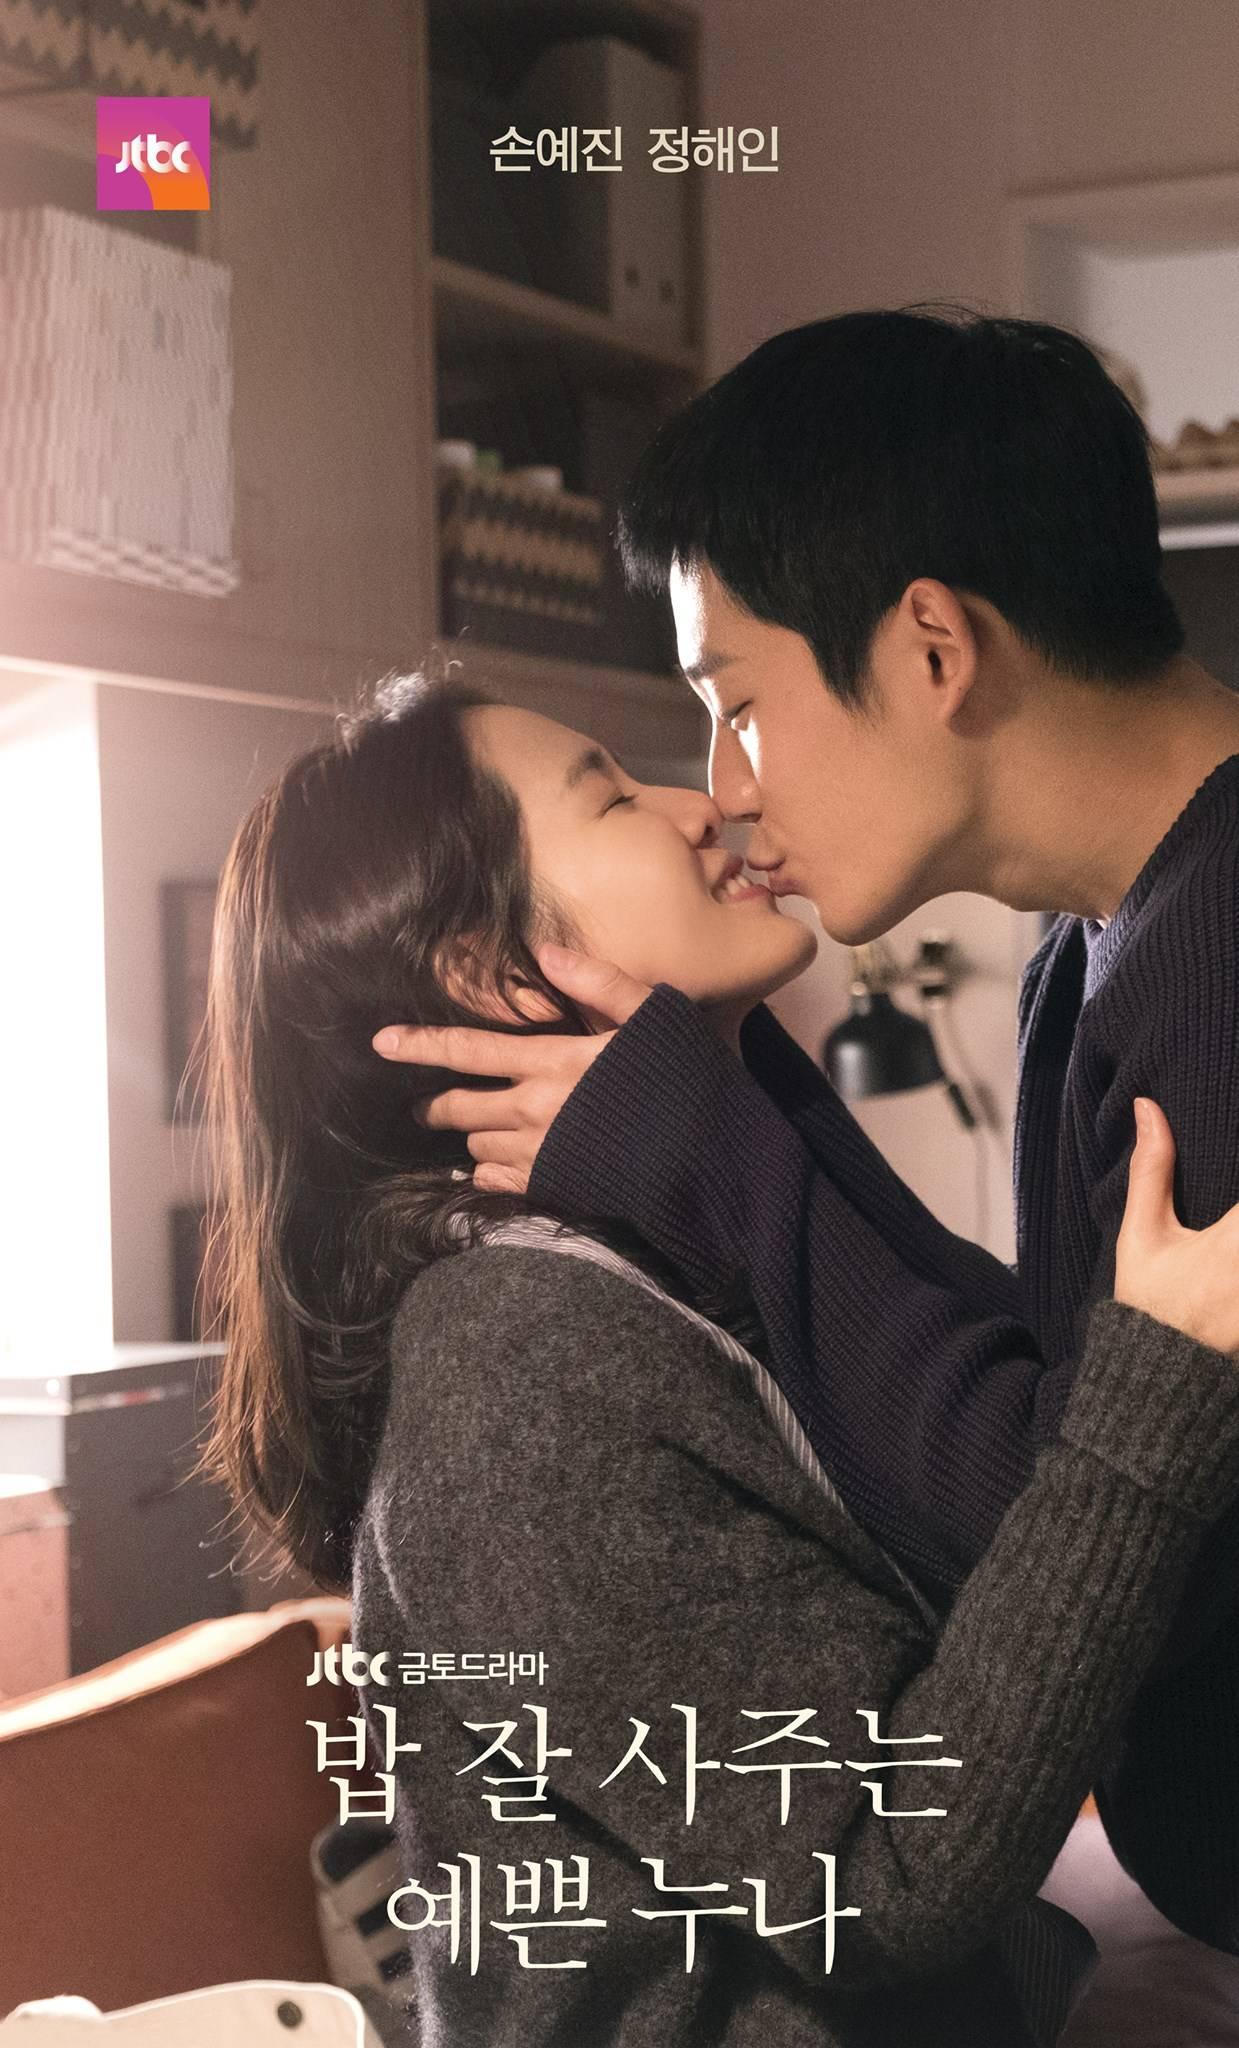 Pretty Sister Who Buys Me Food Cast (Korean Drama - 2018